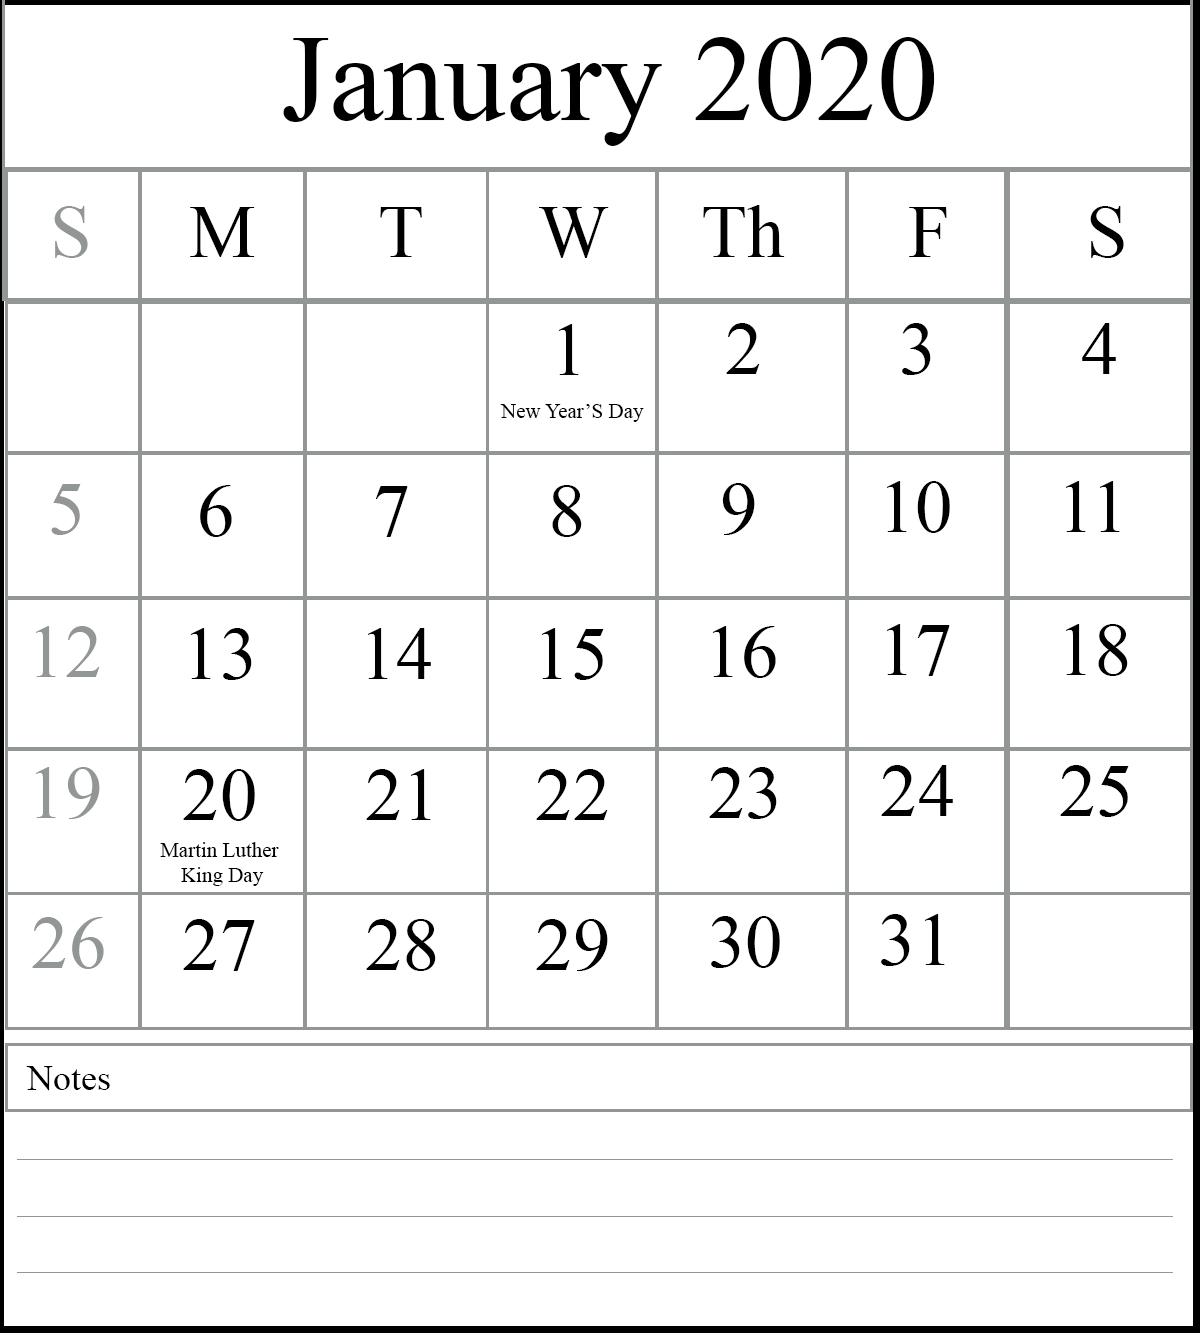 Printable Free January And February 2020 Calendar Templates-Calendar Of January And February 2020